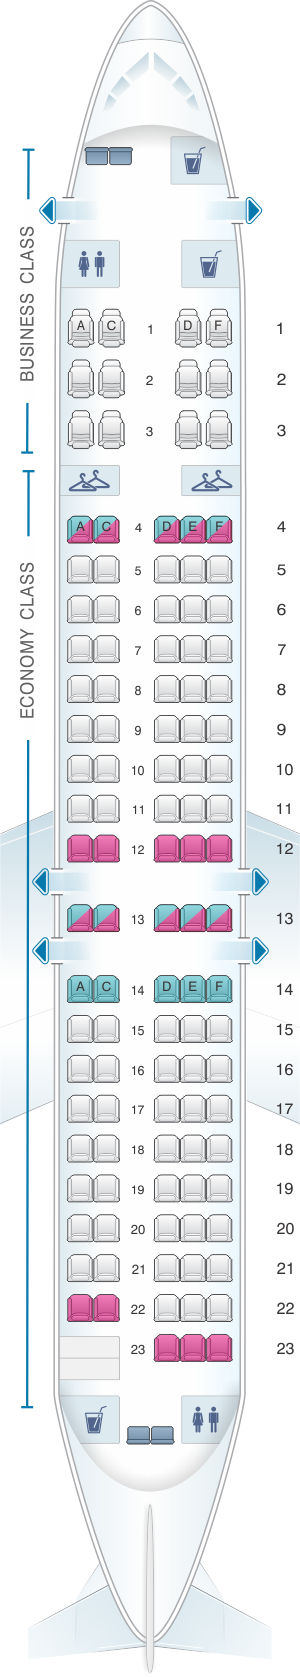 Seat map for QantasLink Boeing B717 200 110PAX